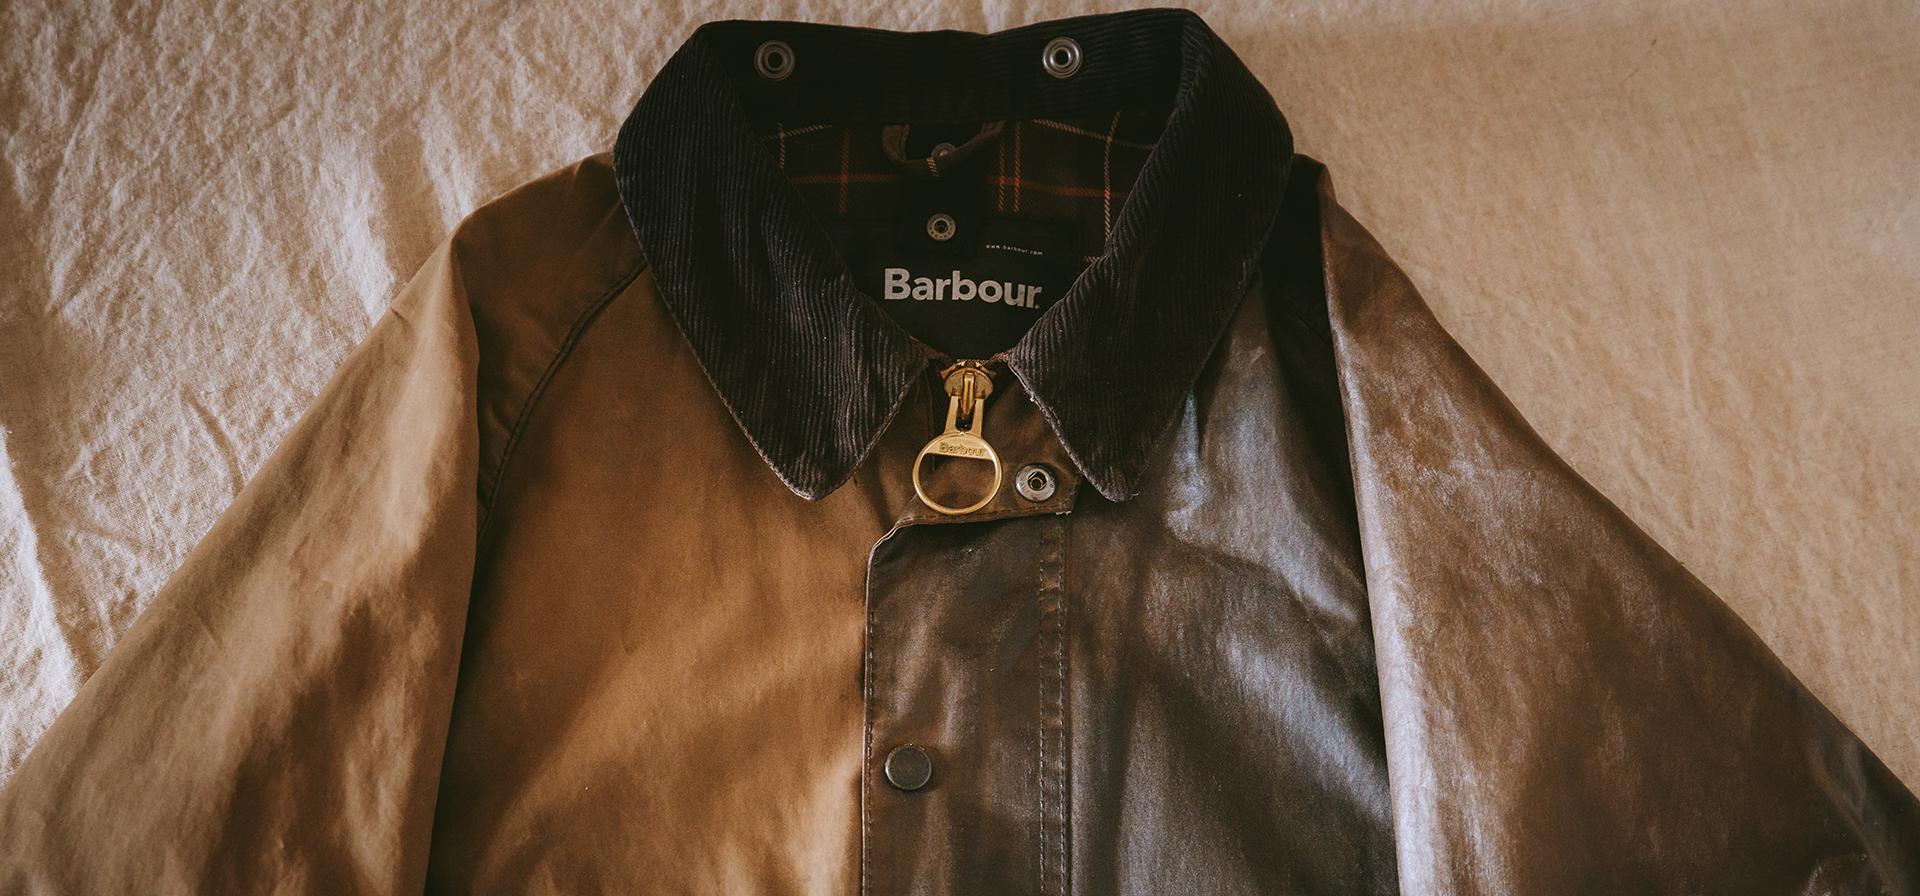 (Barbour) rewaxing classic 6oz wax